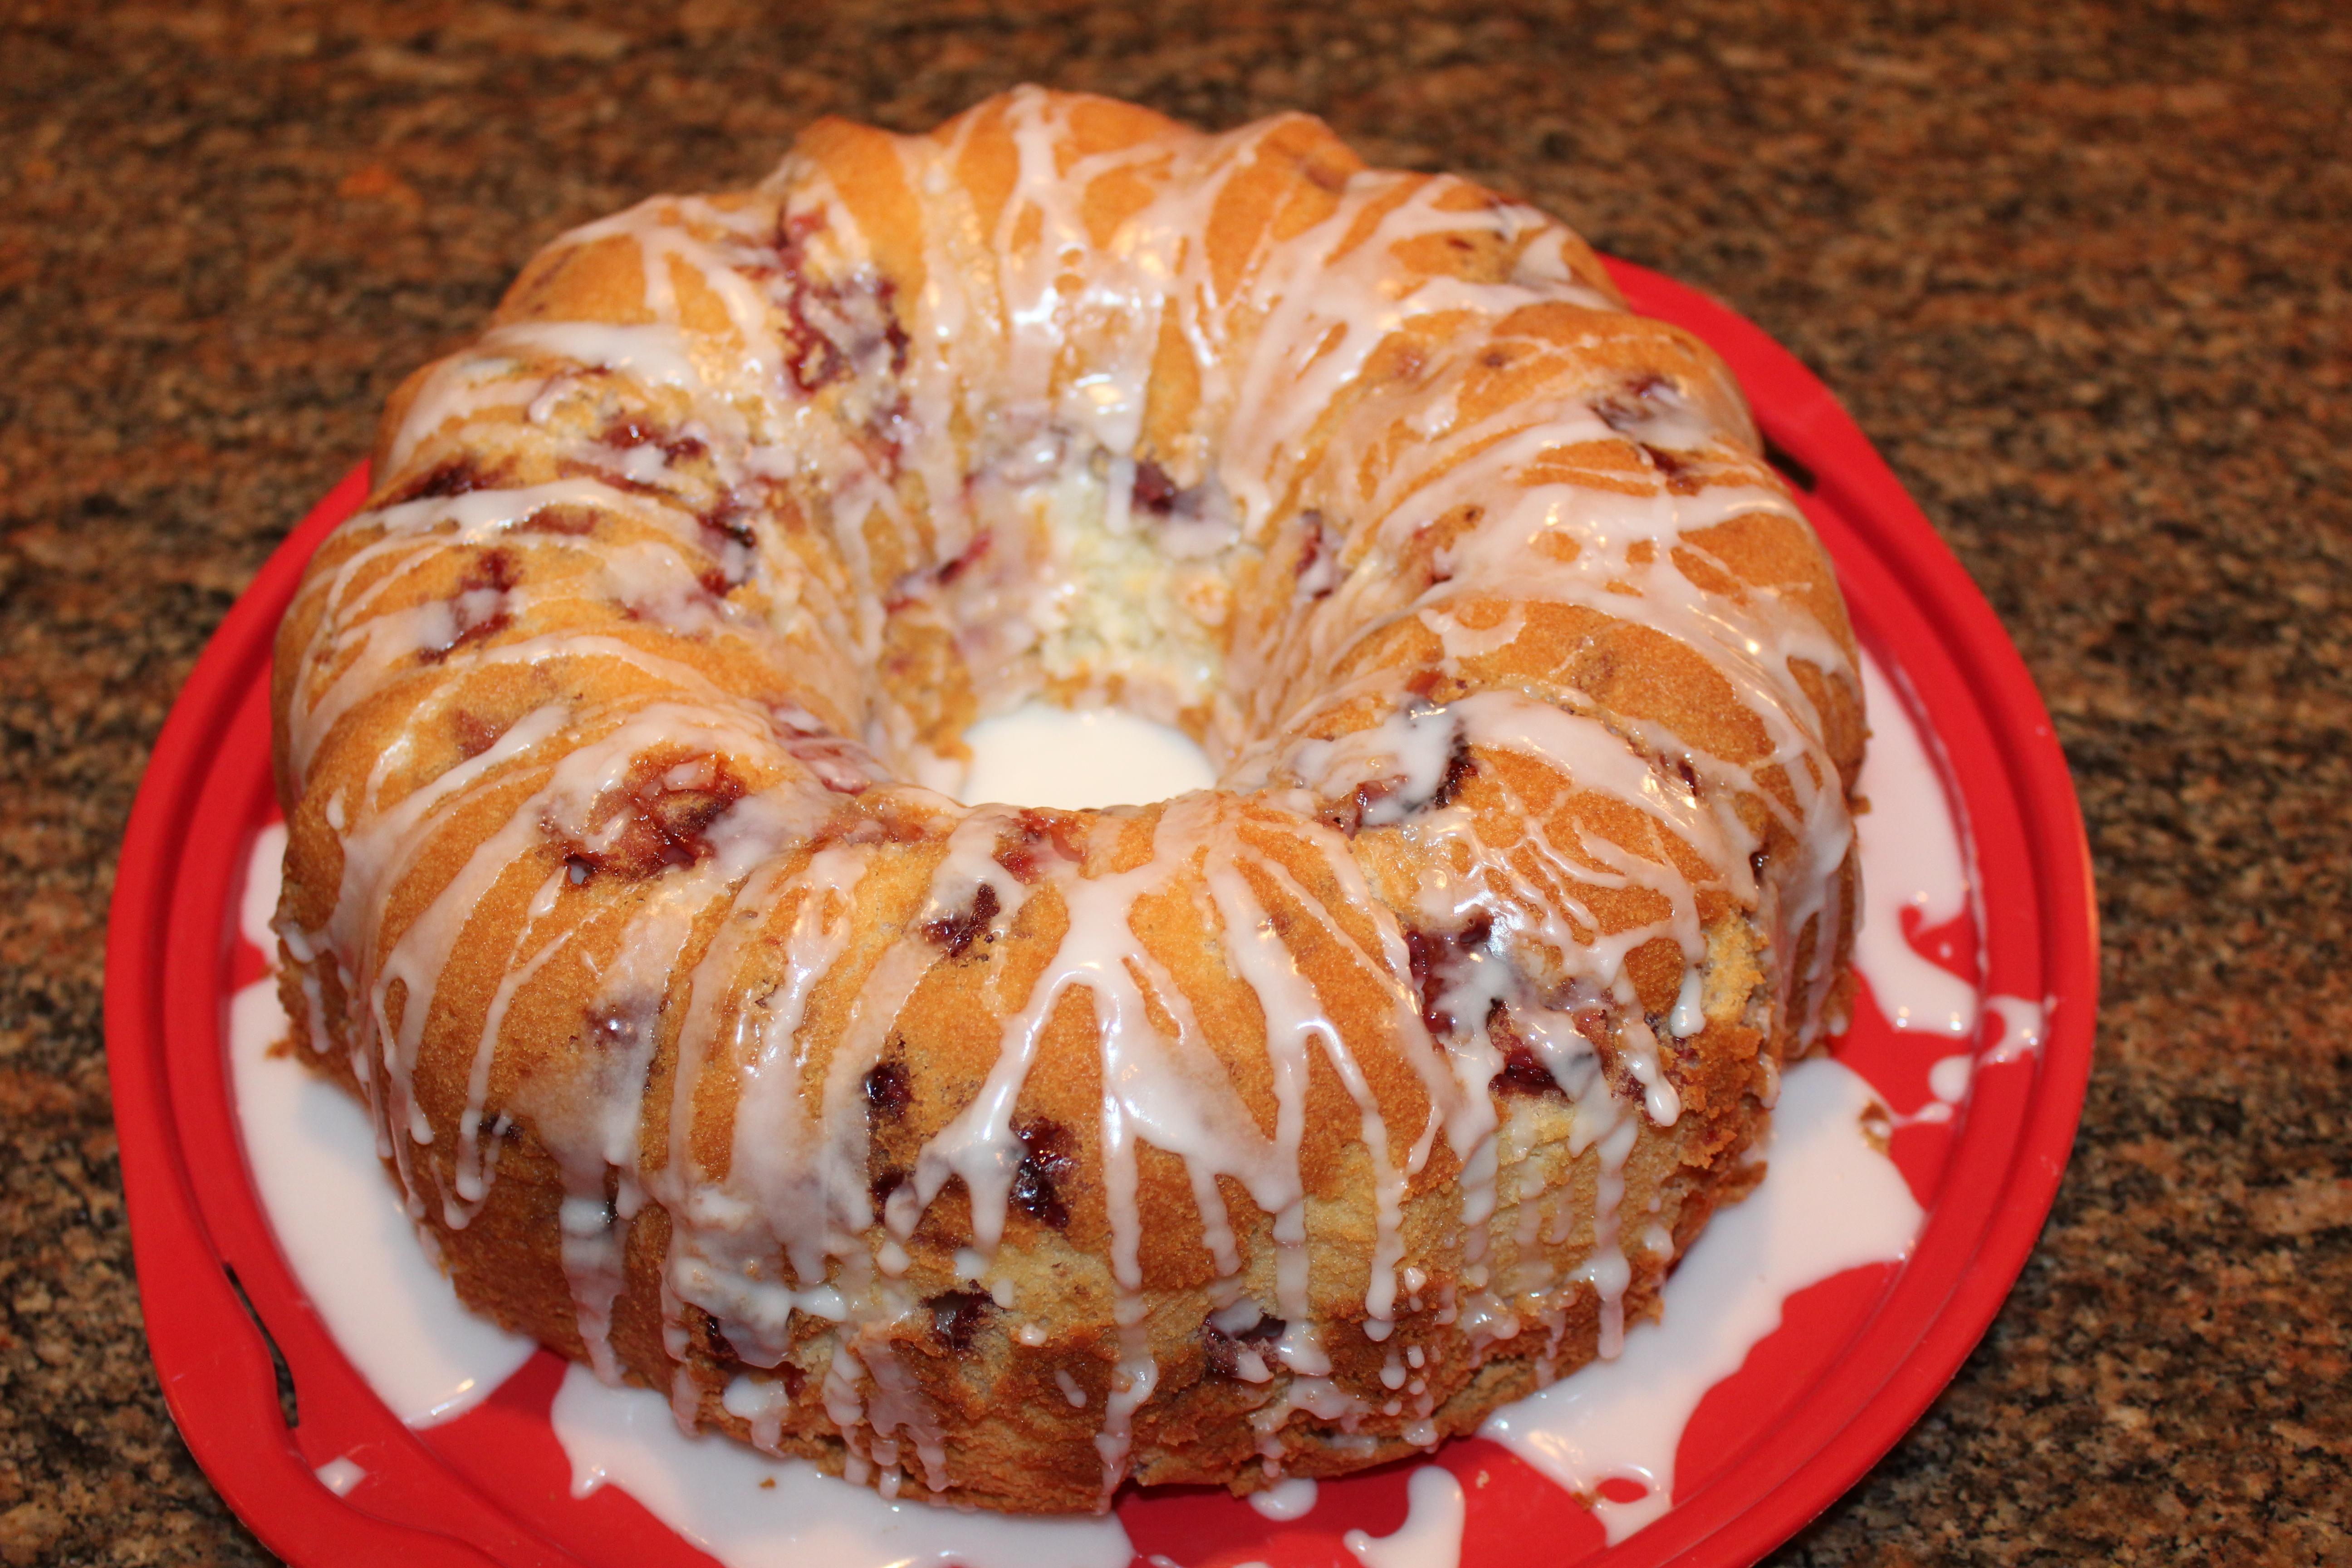 Kel's Straberry lemon bundt cake